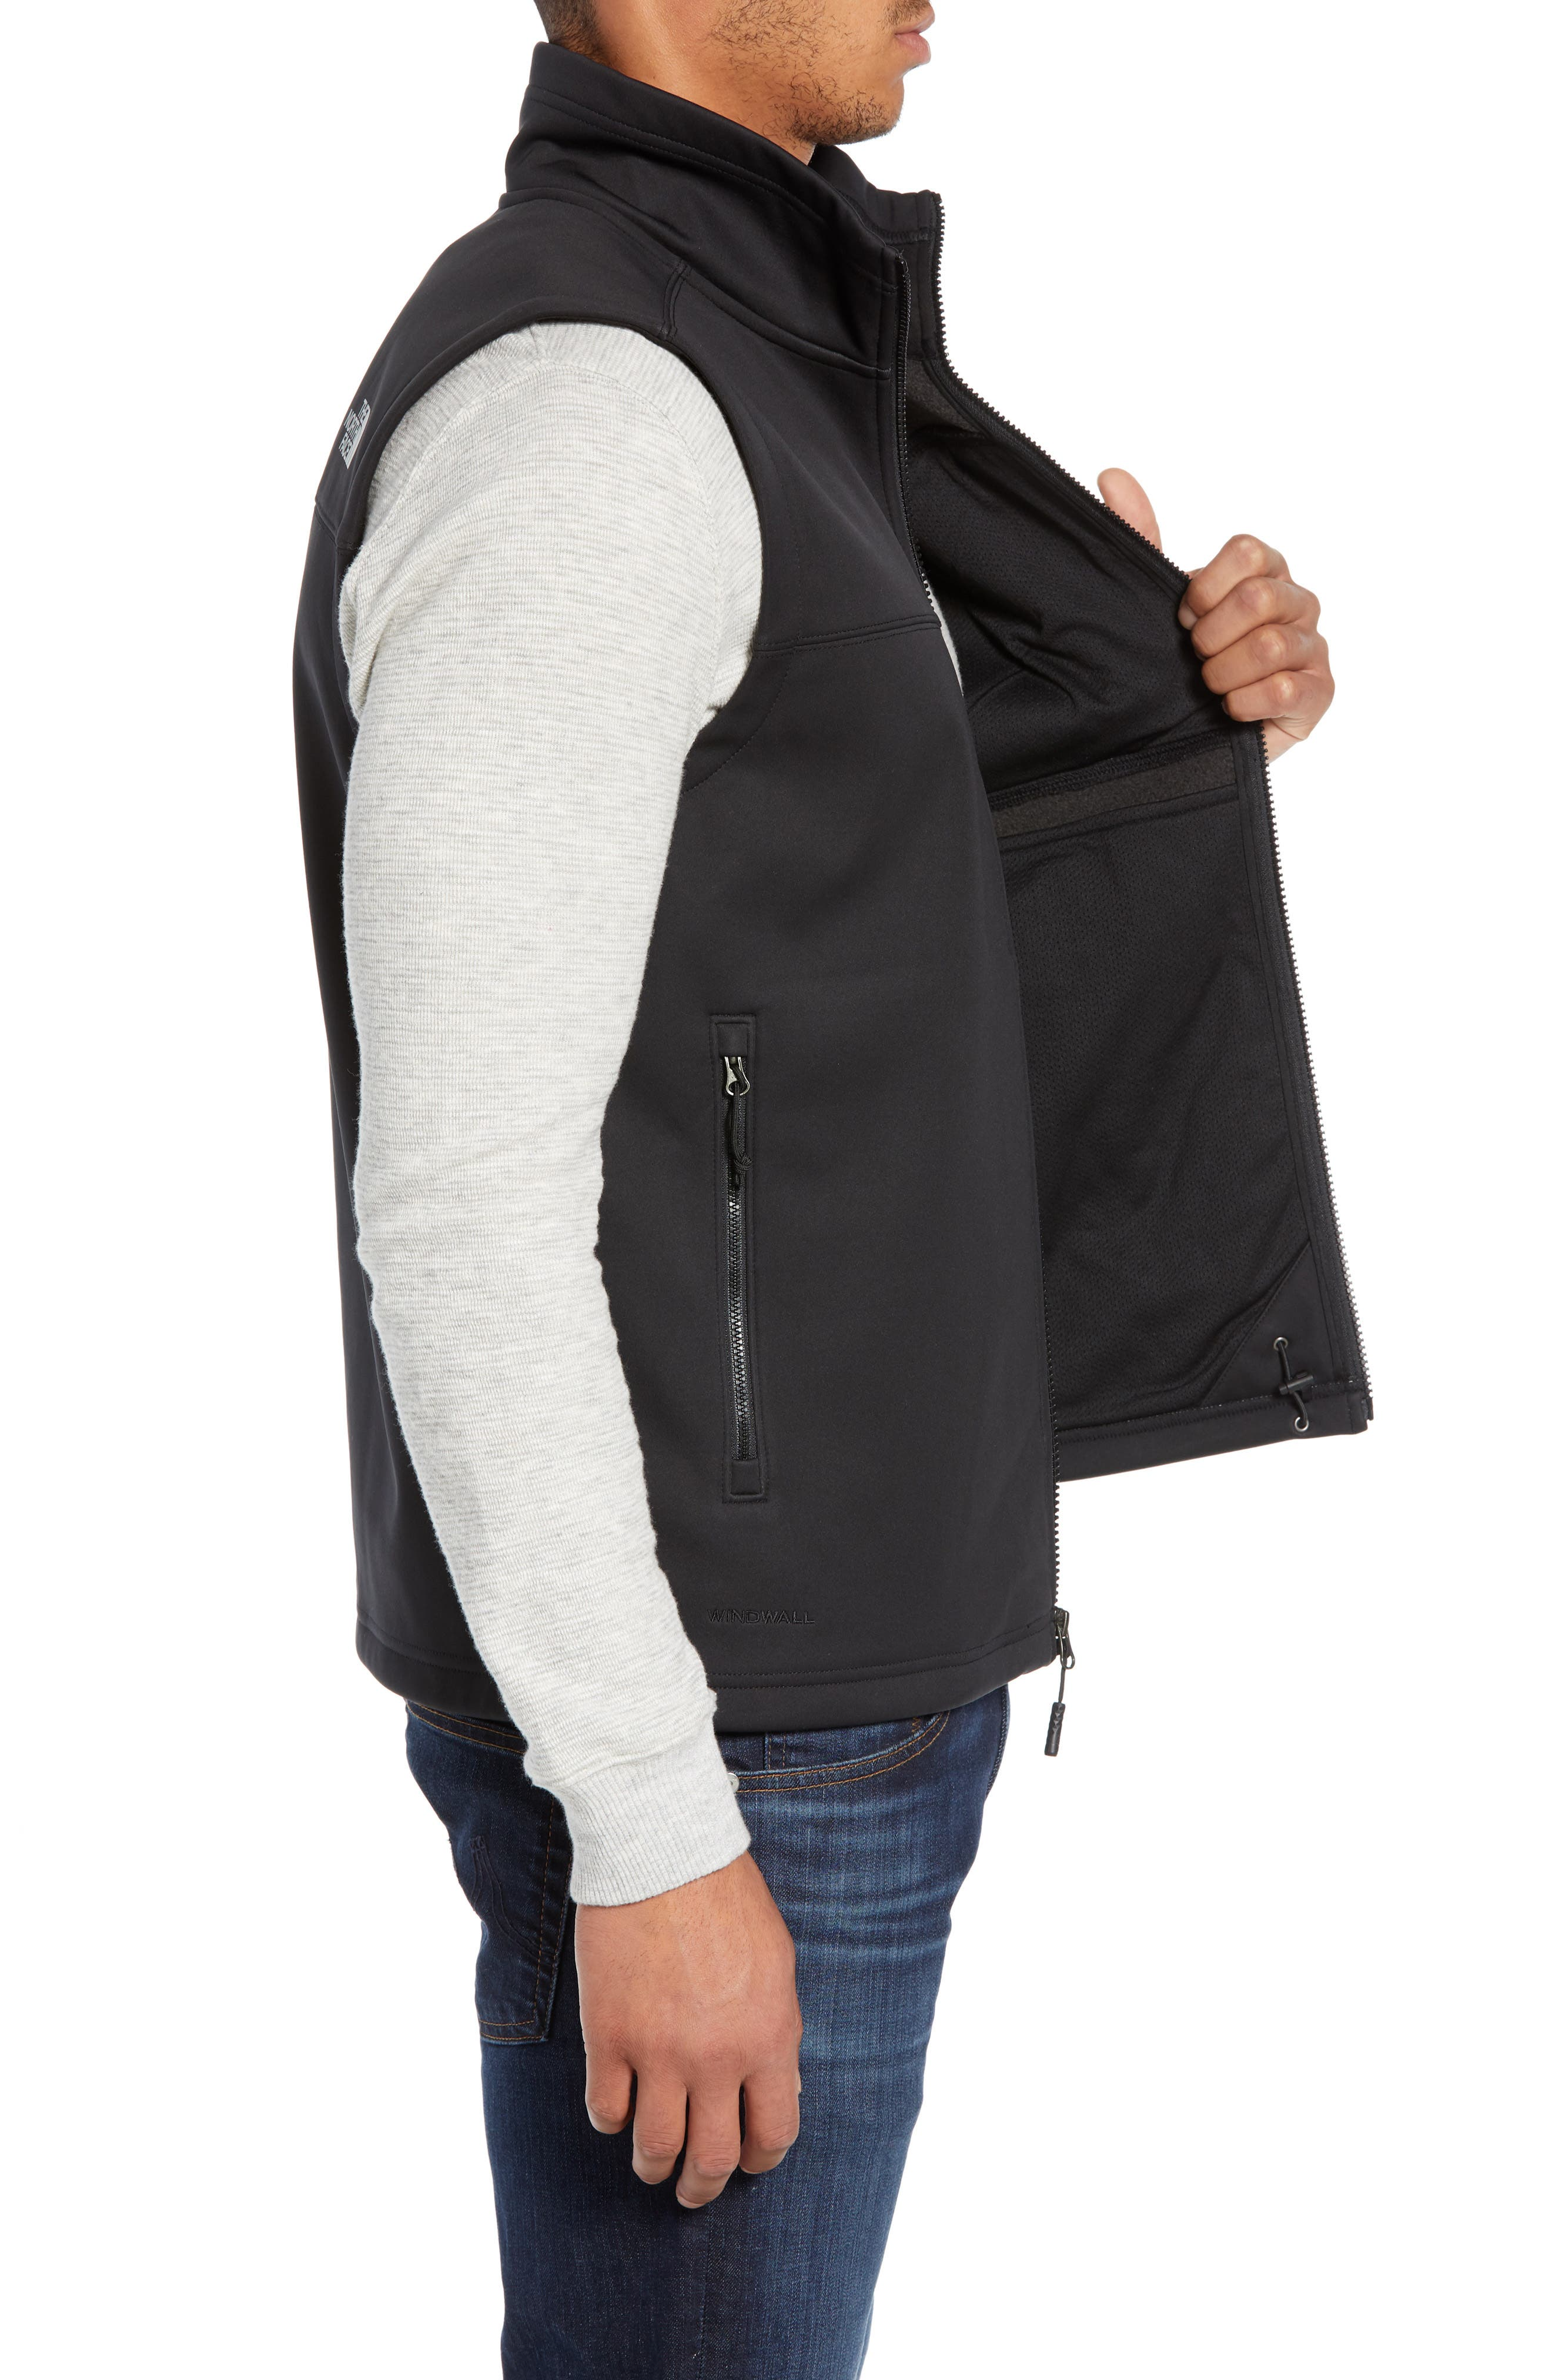 Apex Risor Vest,                             Alternate thumbnail 3, color,                             TNF BLACK/ TNF BLACK